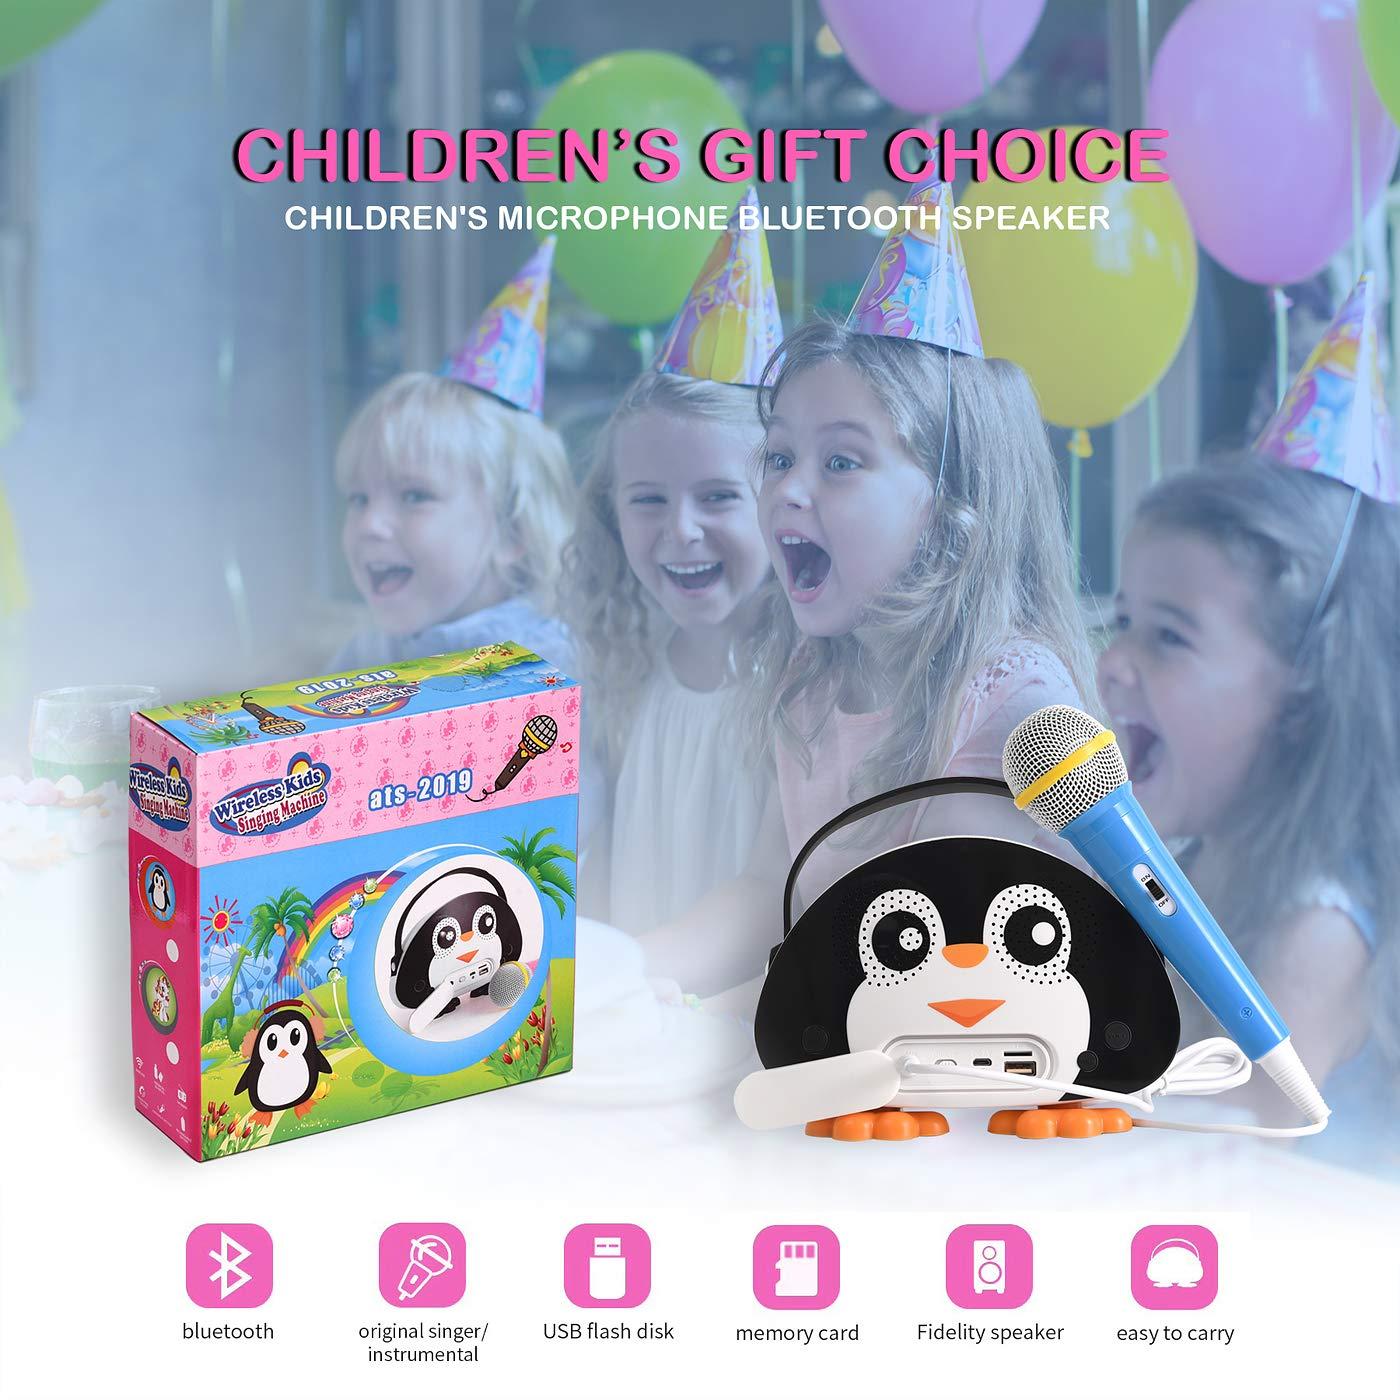 HowQ Outdoor Toys Karaoke Machine , Portable Kids Karaoke Bluetooth Speaker Wireless Cartoon Speaker for Kids for Indoor Toys Travel Activities with Microphone Penguin Karaoke Machine(Black-White) by HowQ (Image #10)